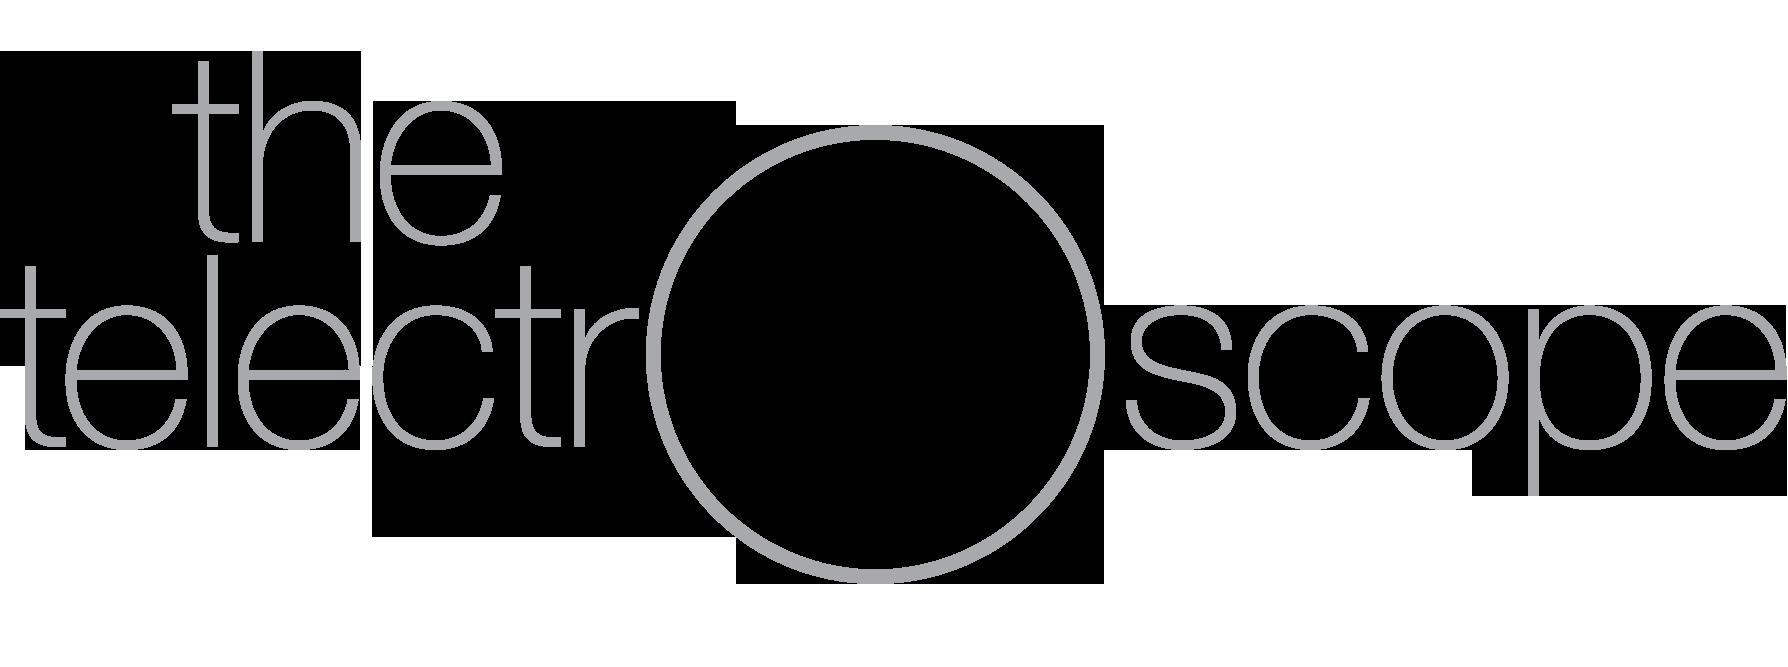 Telectroscope logo